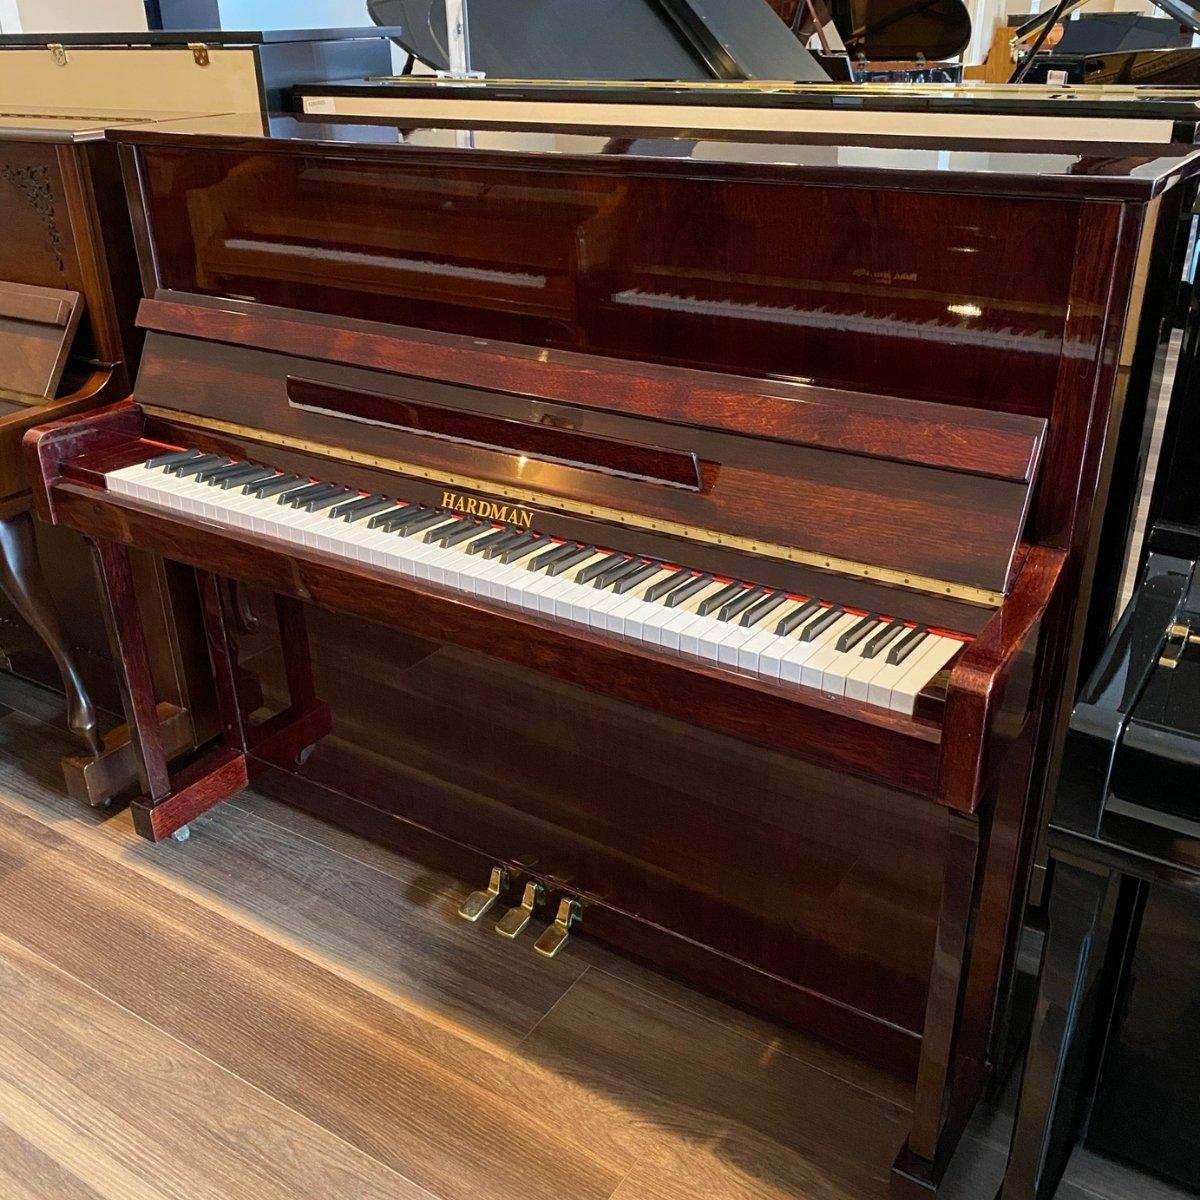 Hardman 48 Upright Piano